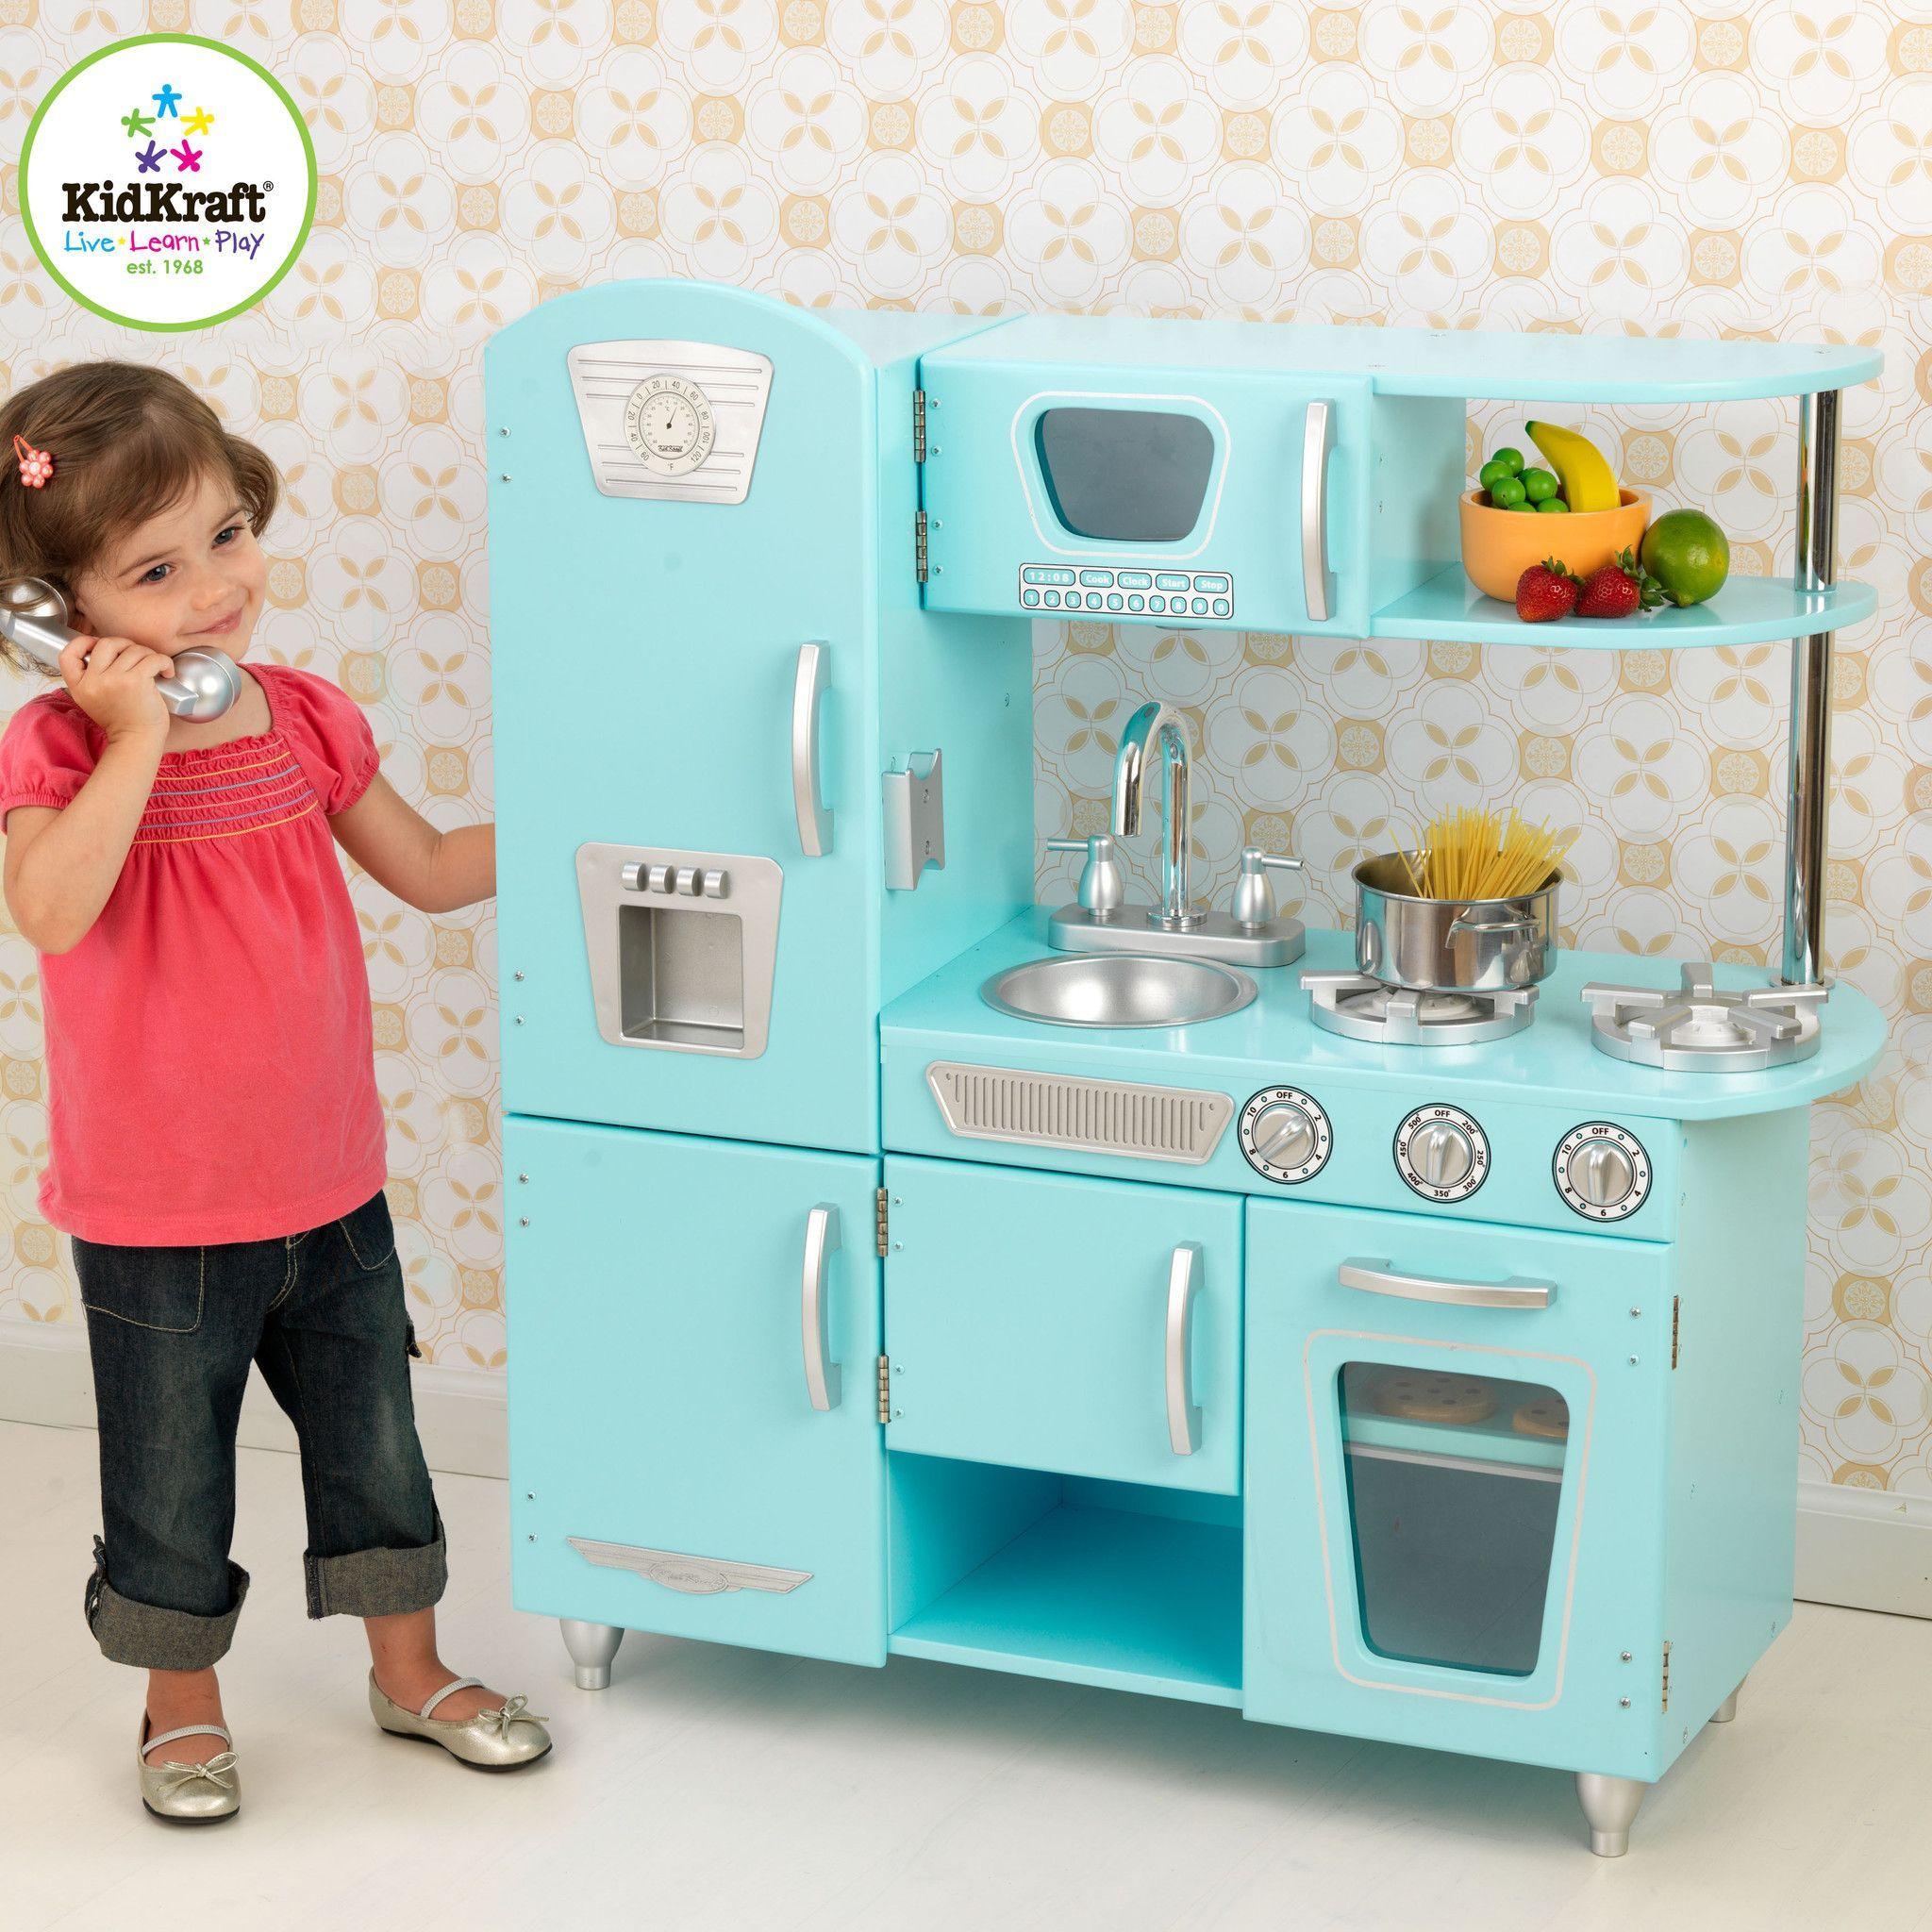 Blue Vintage Kitchen | Products | Pinterest | Vintage kitchen and ...